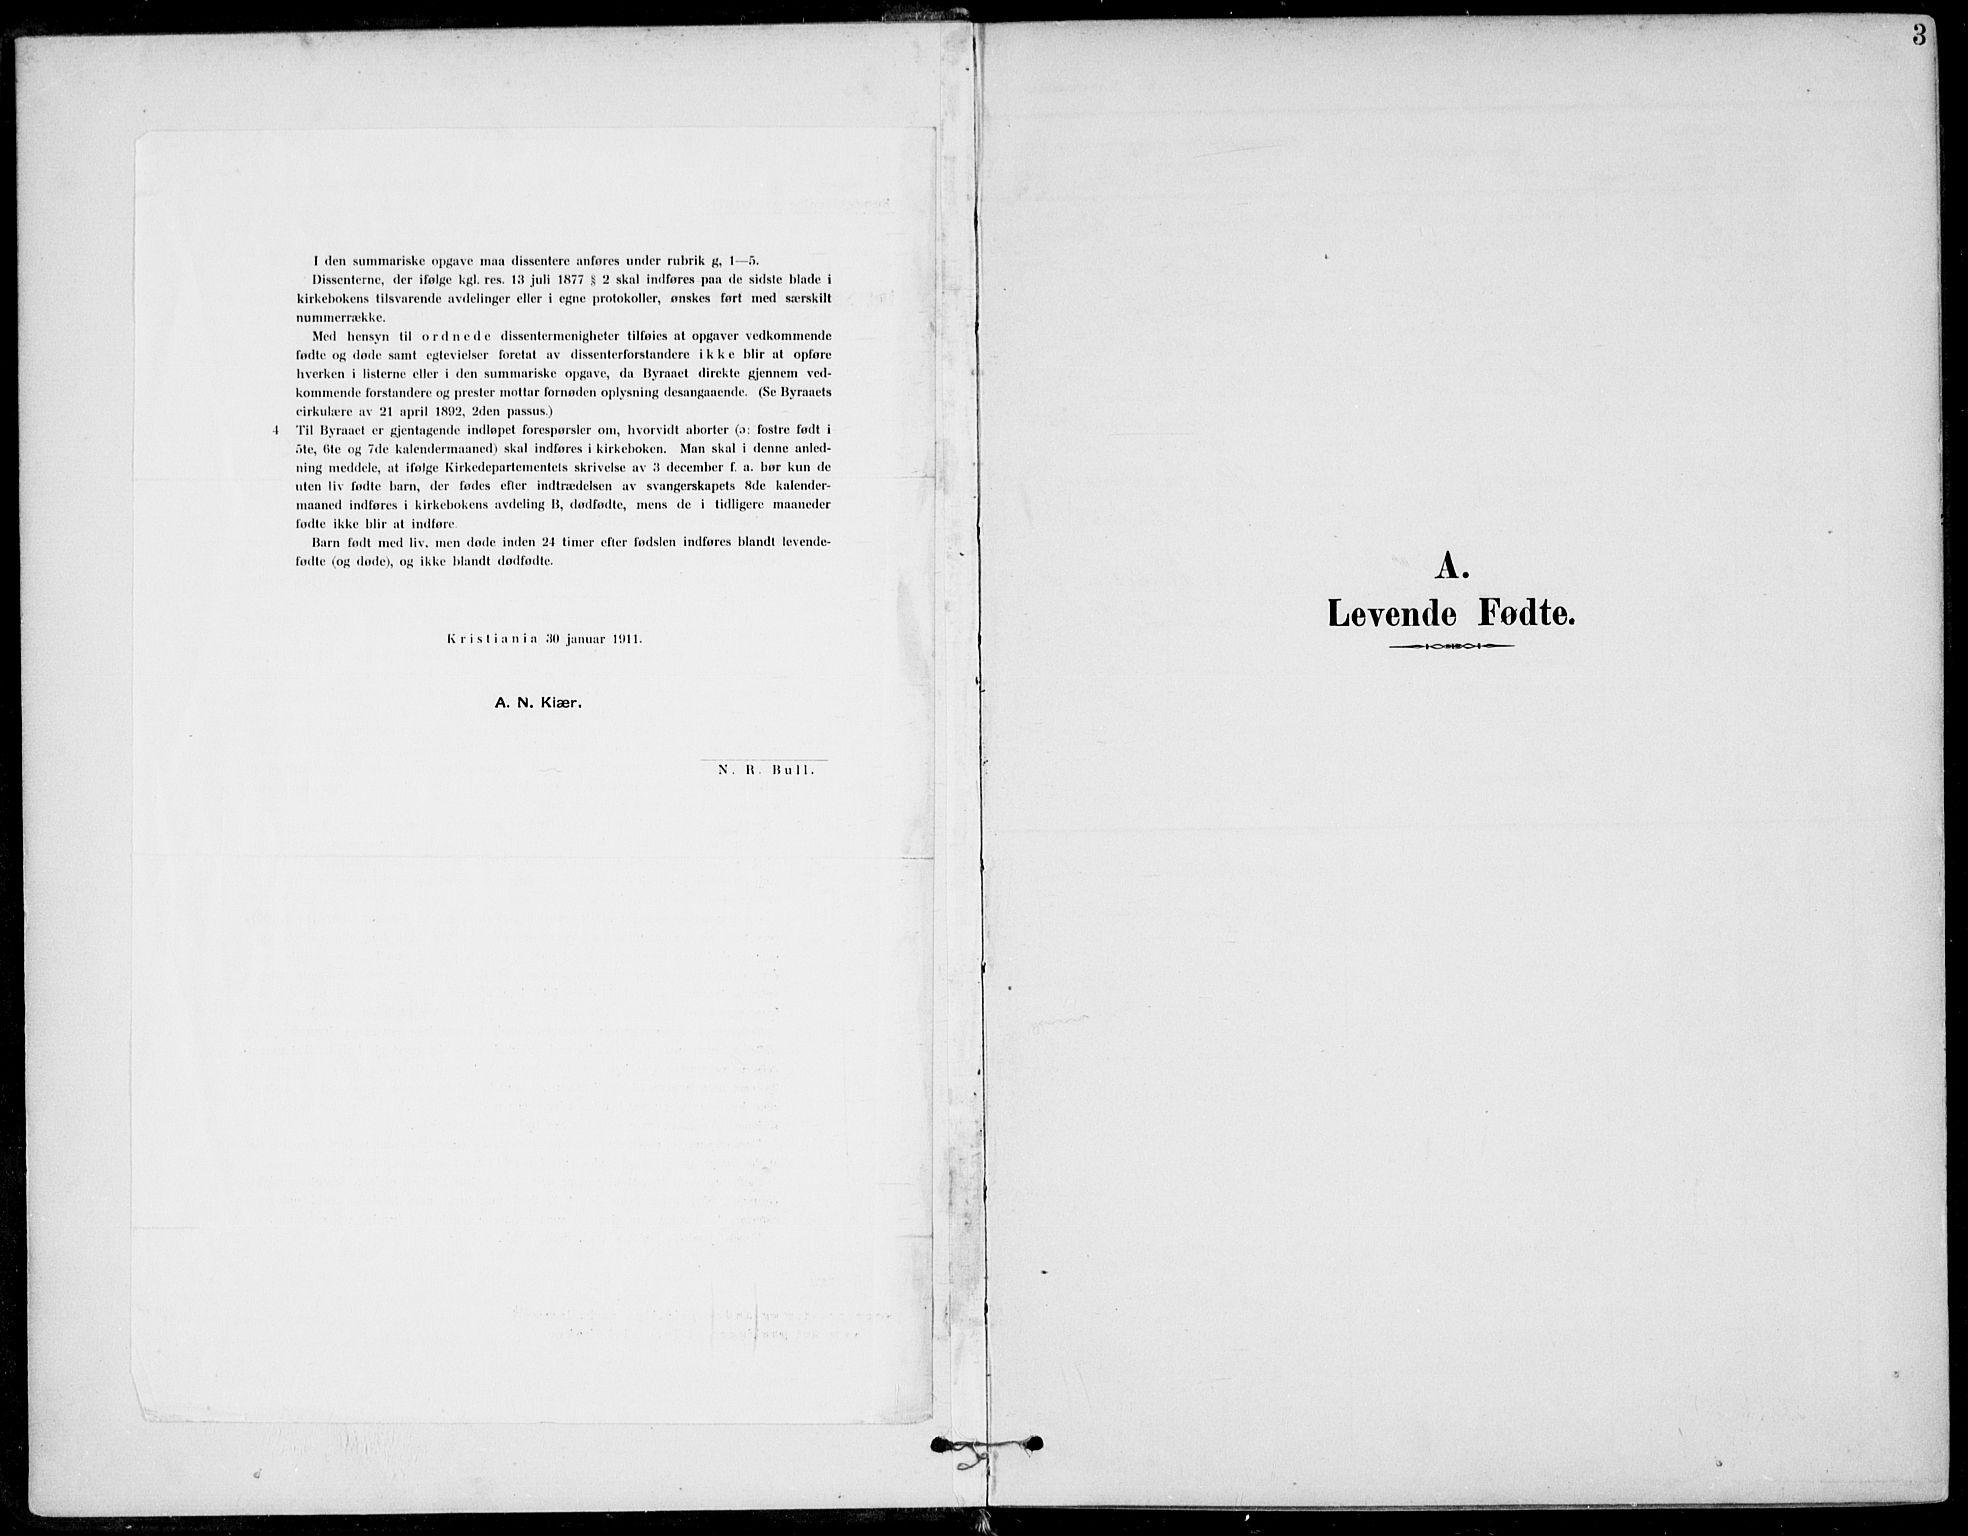 SAKO, Sigdal kirkebøker, F/Fb/L0002: Ministerialbok nr. II 2, 1901-1914, s. 3